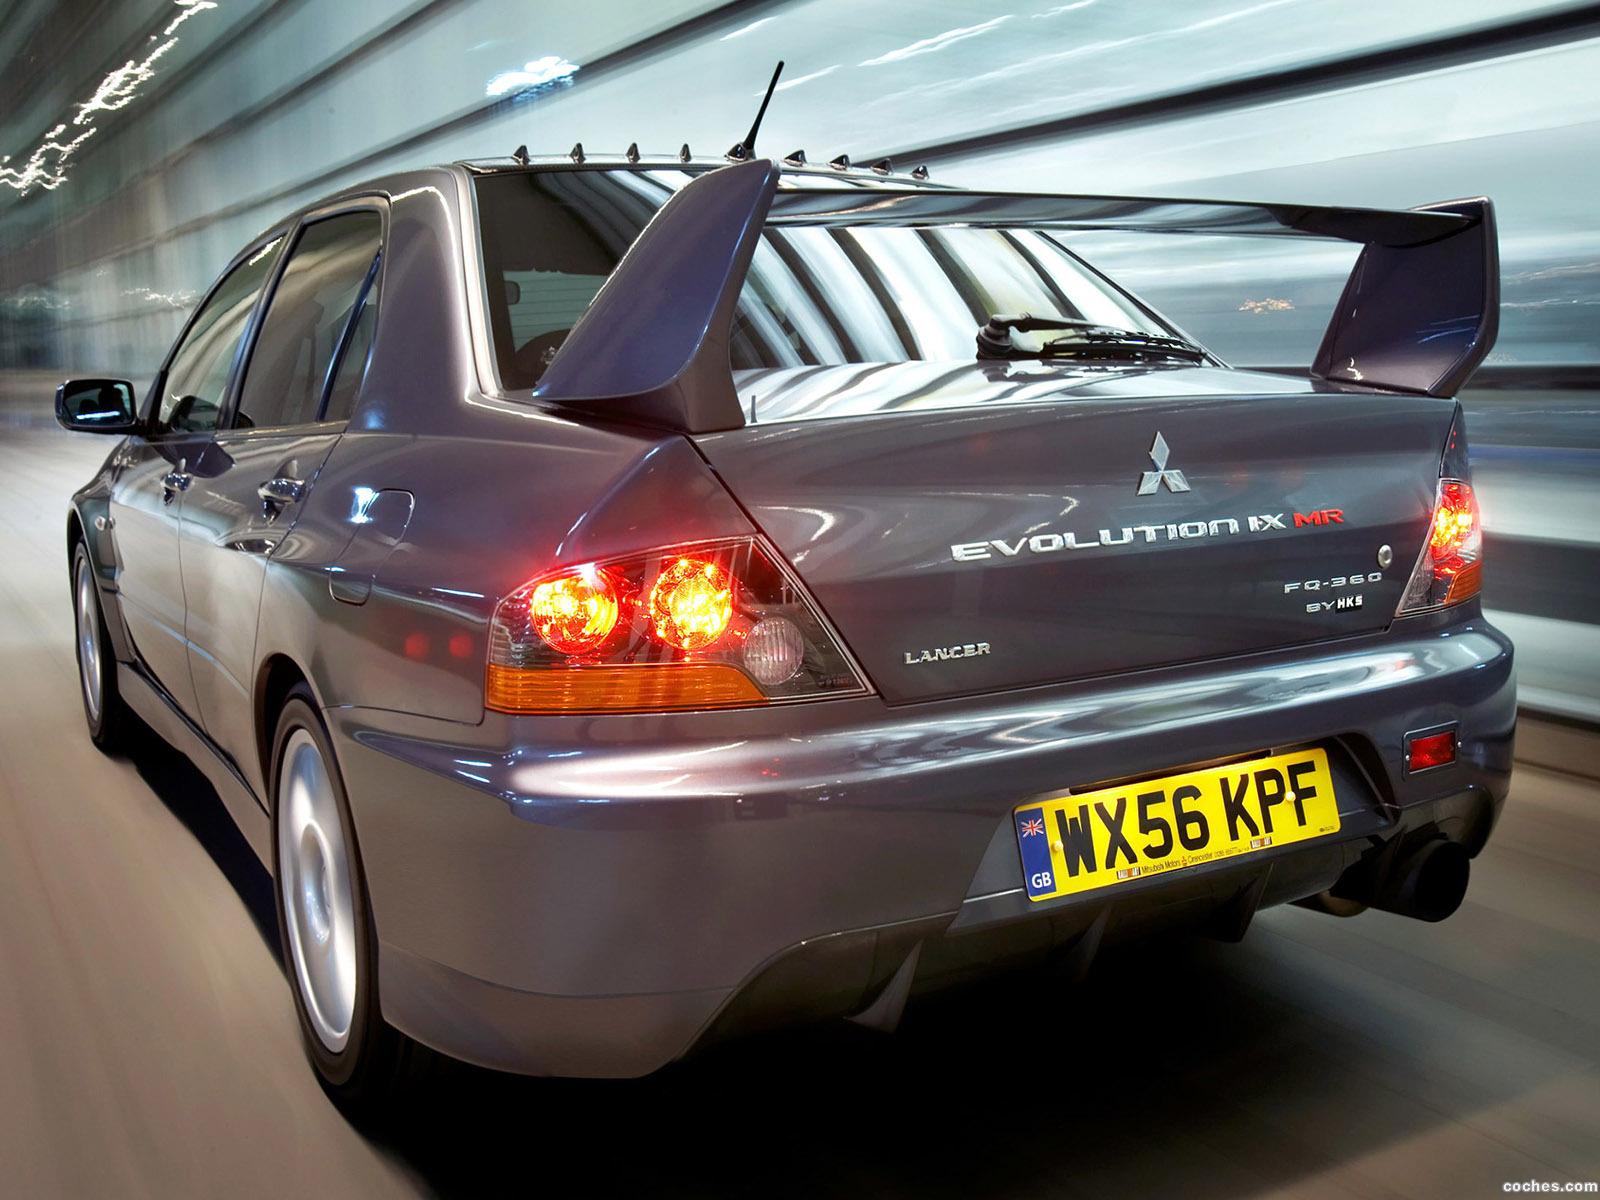 Foto 5 de Mitsubishi Lancer Evolution IX MR FQ 360 Final Edition 2007